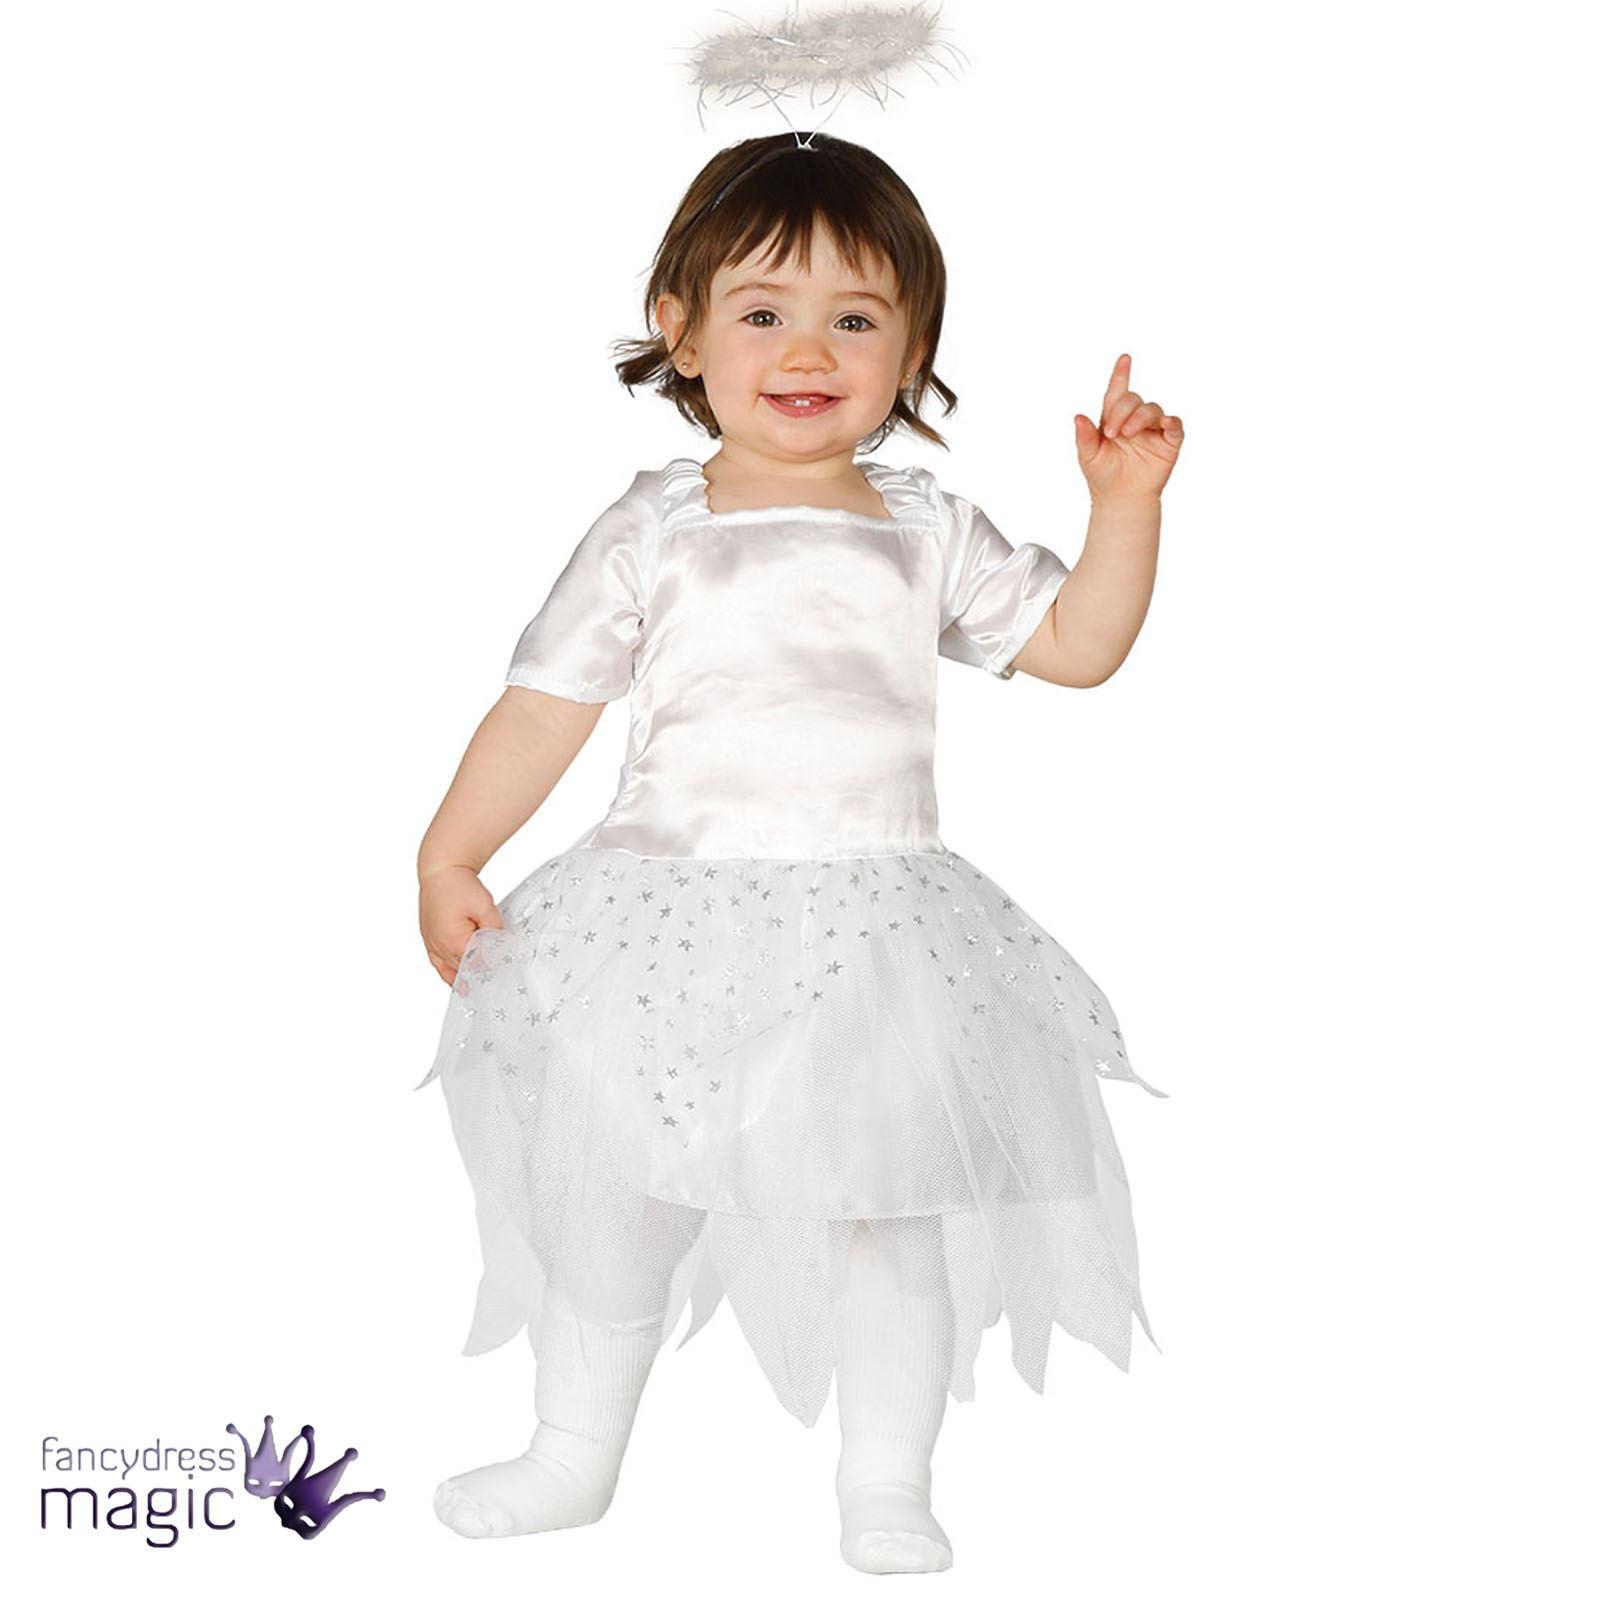 Baby Toddler Christmas Xmas Angel Fairy Fancy Dress Costume Outfit Halo  Headband 9cd5c87bfaf